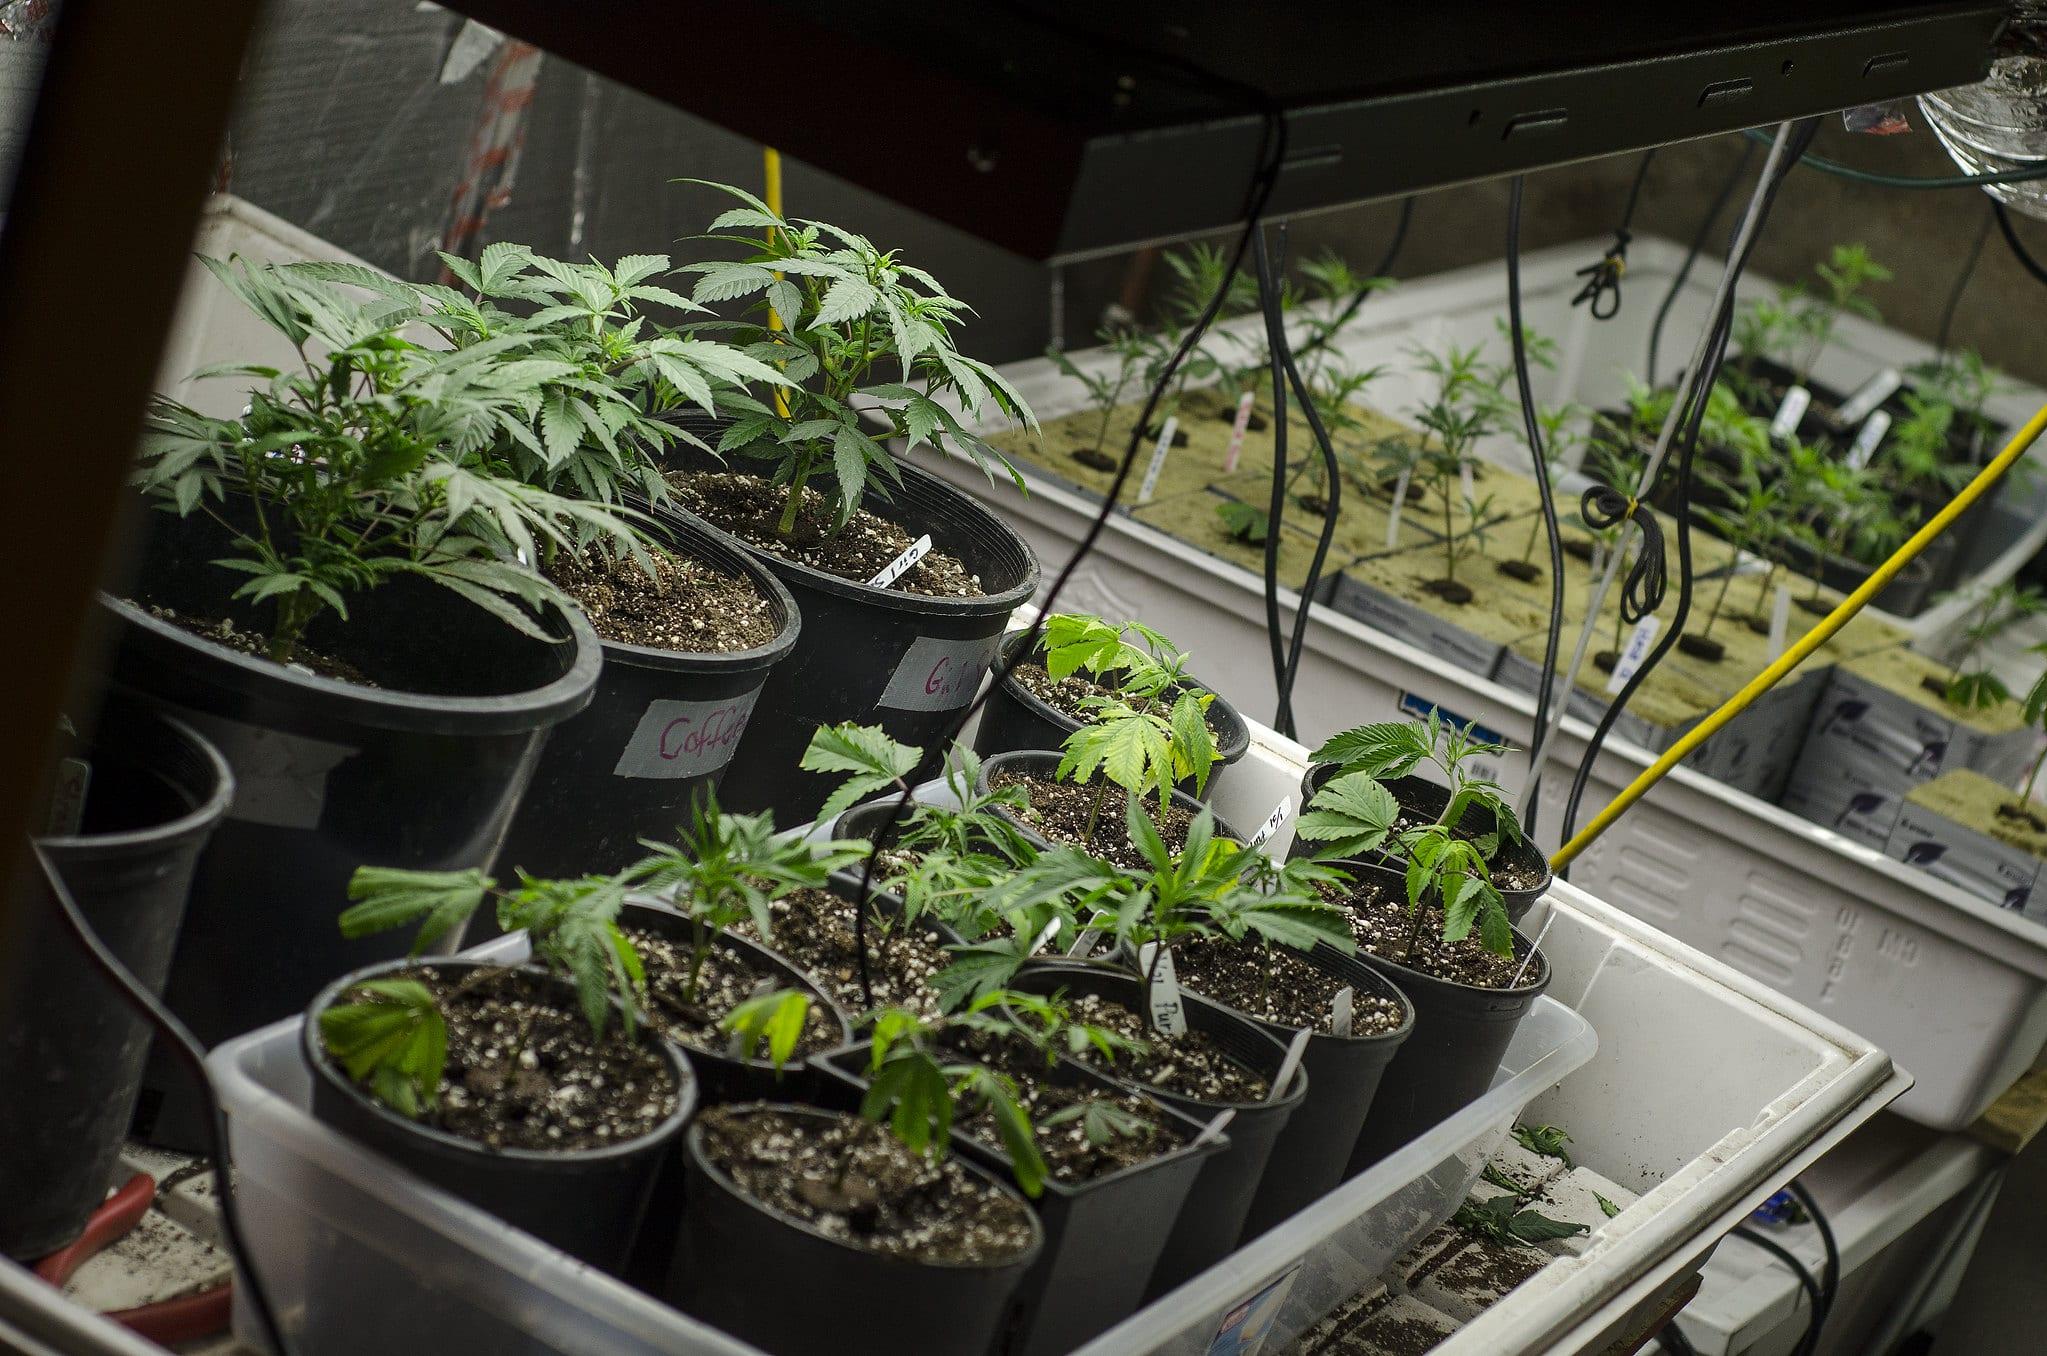 image of marijuana plant